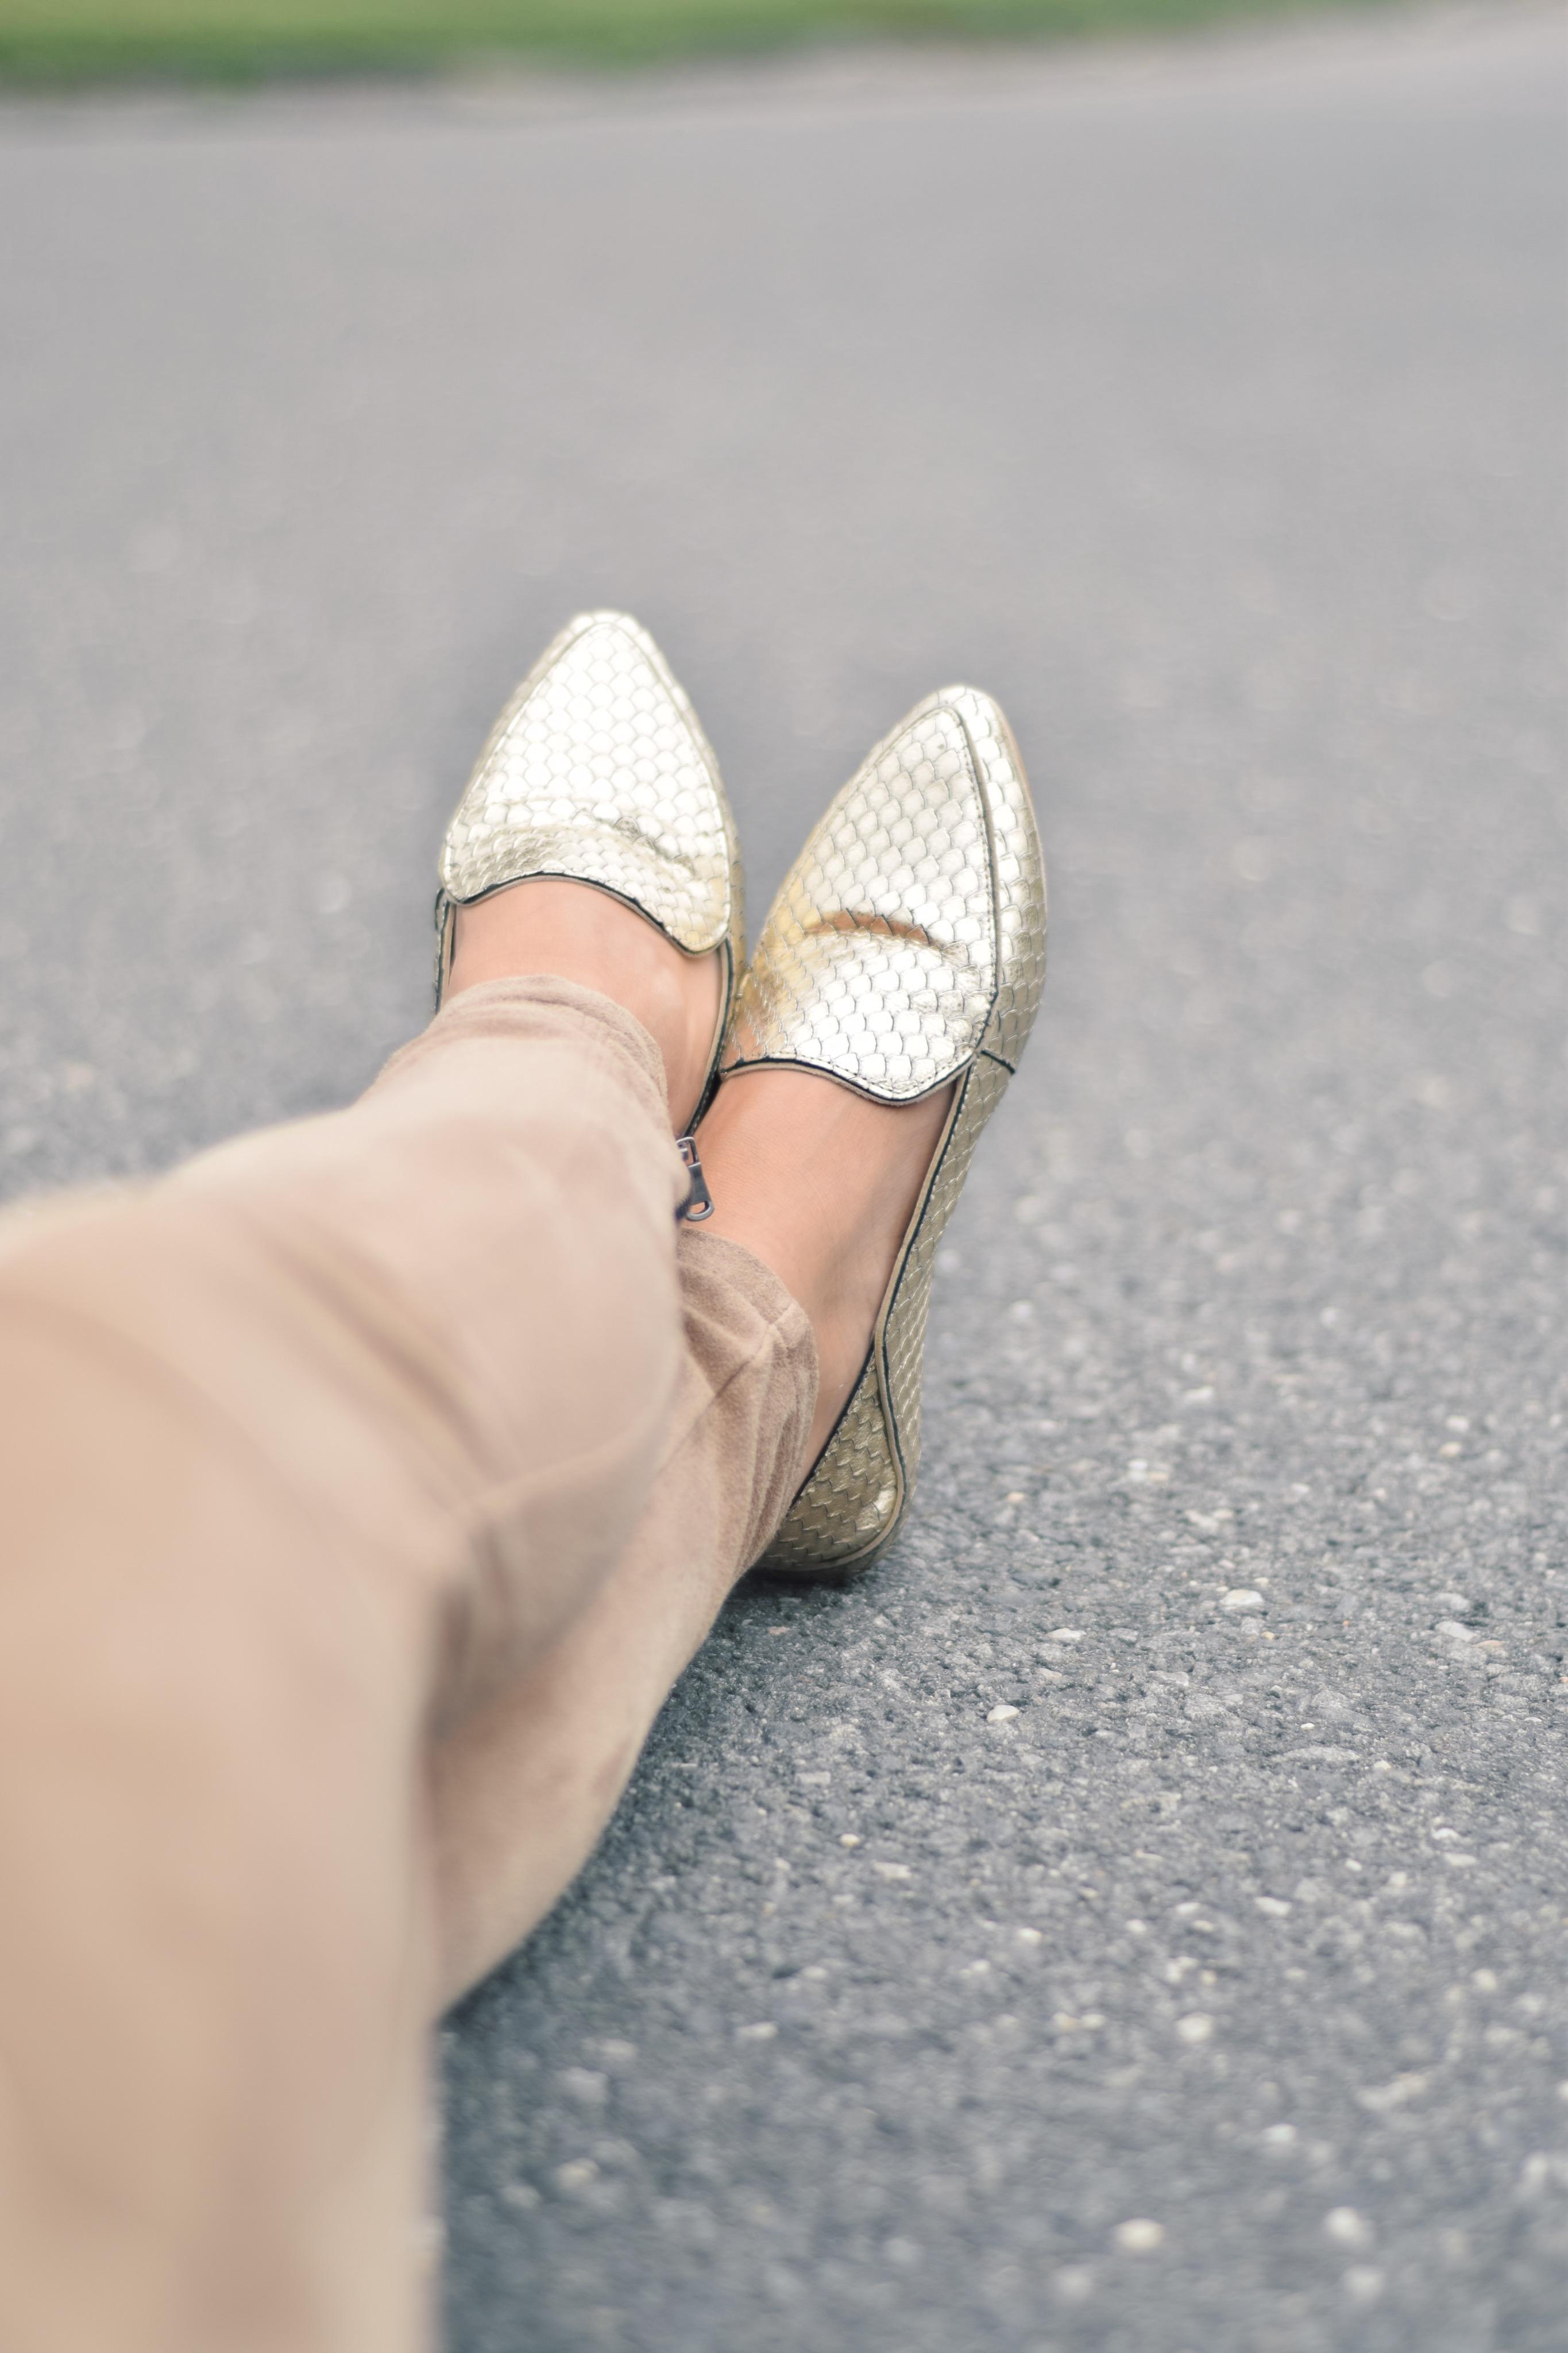 yosi samra-shoes-style-simply by simone